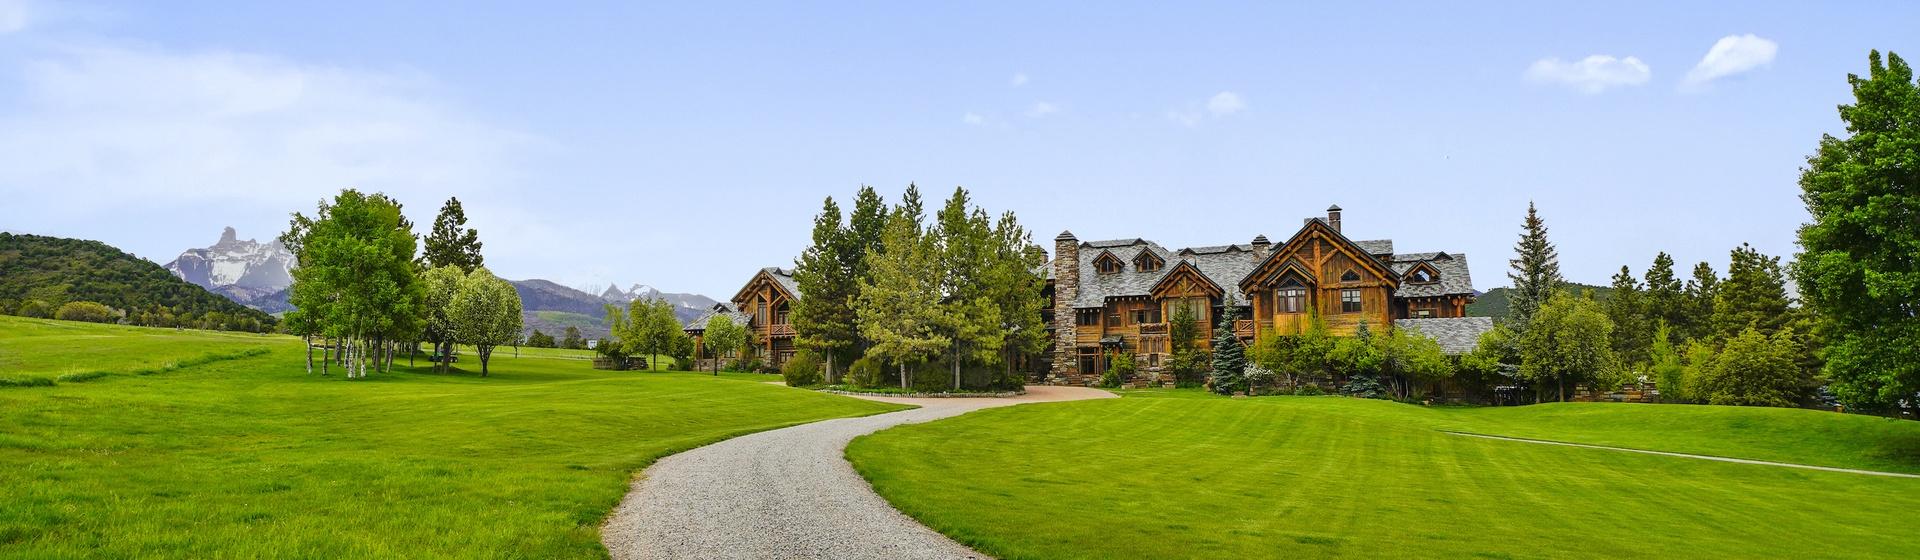 13.6-Telluride-Sleeping-Indian-Ranch-exterior-main-2-web.JPG